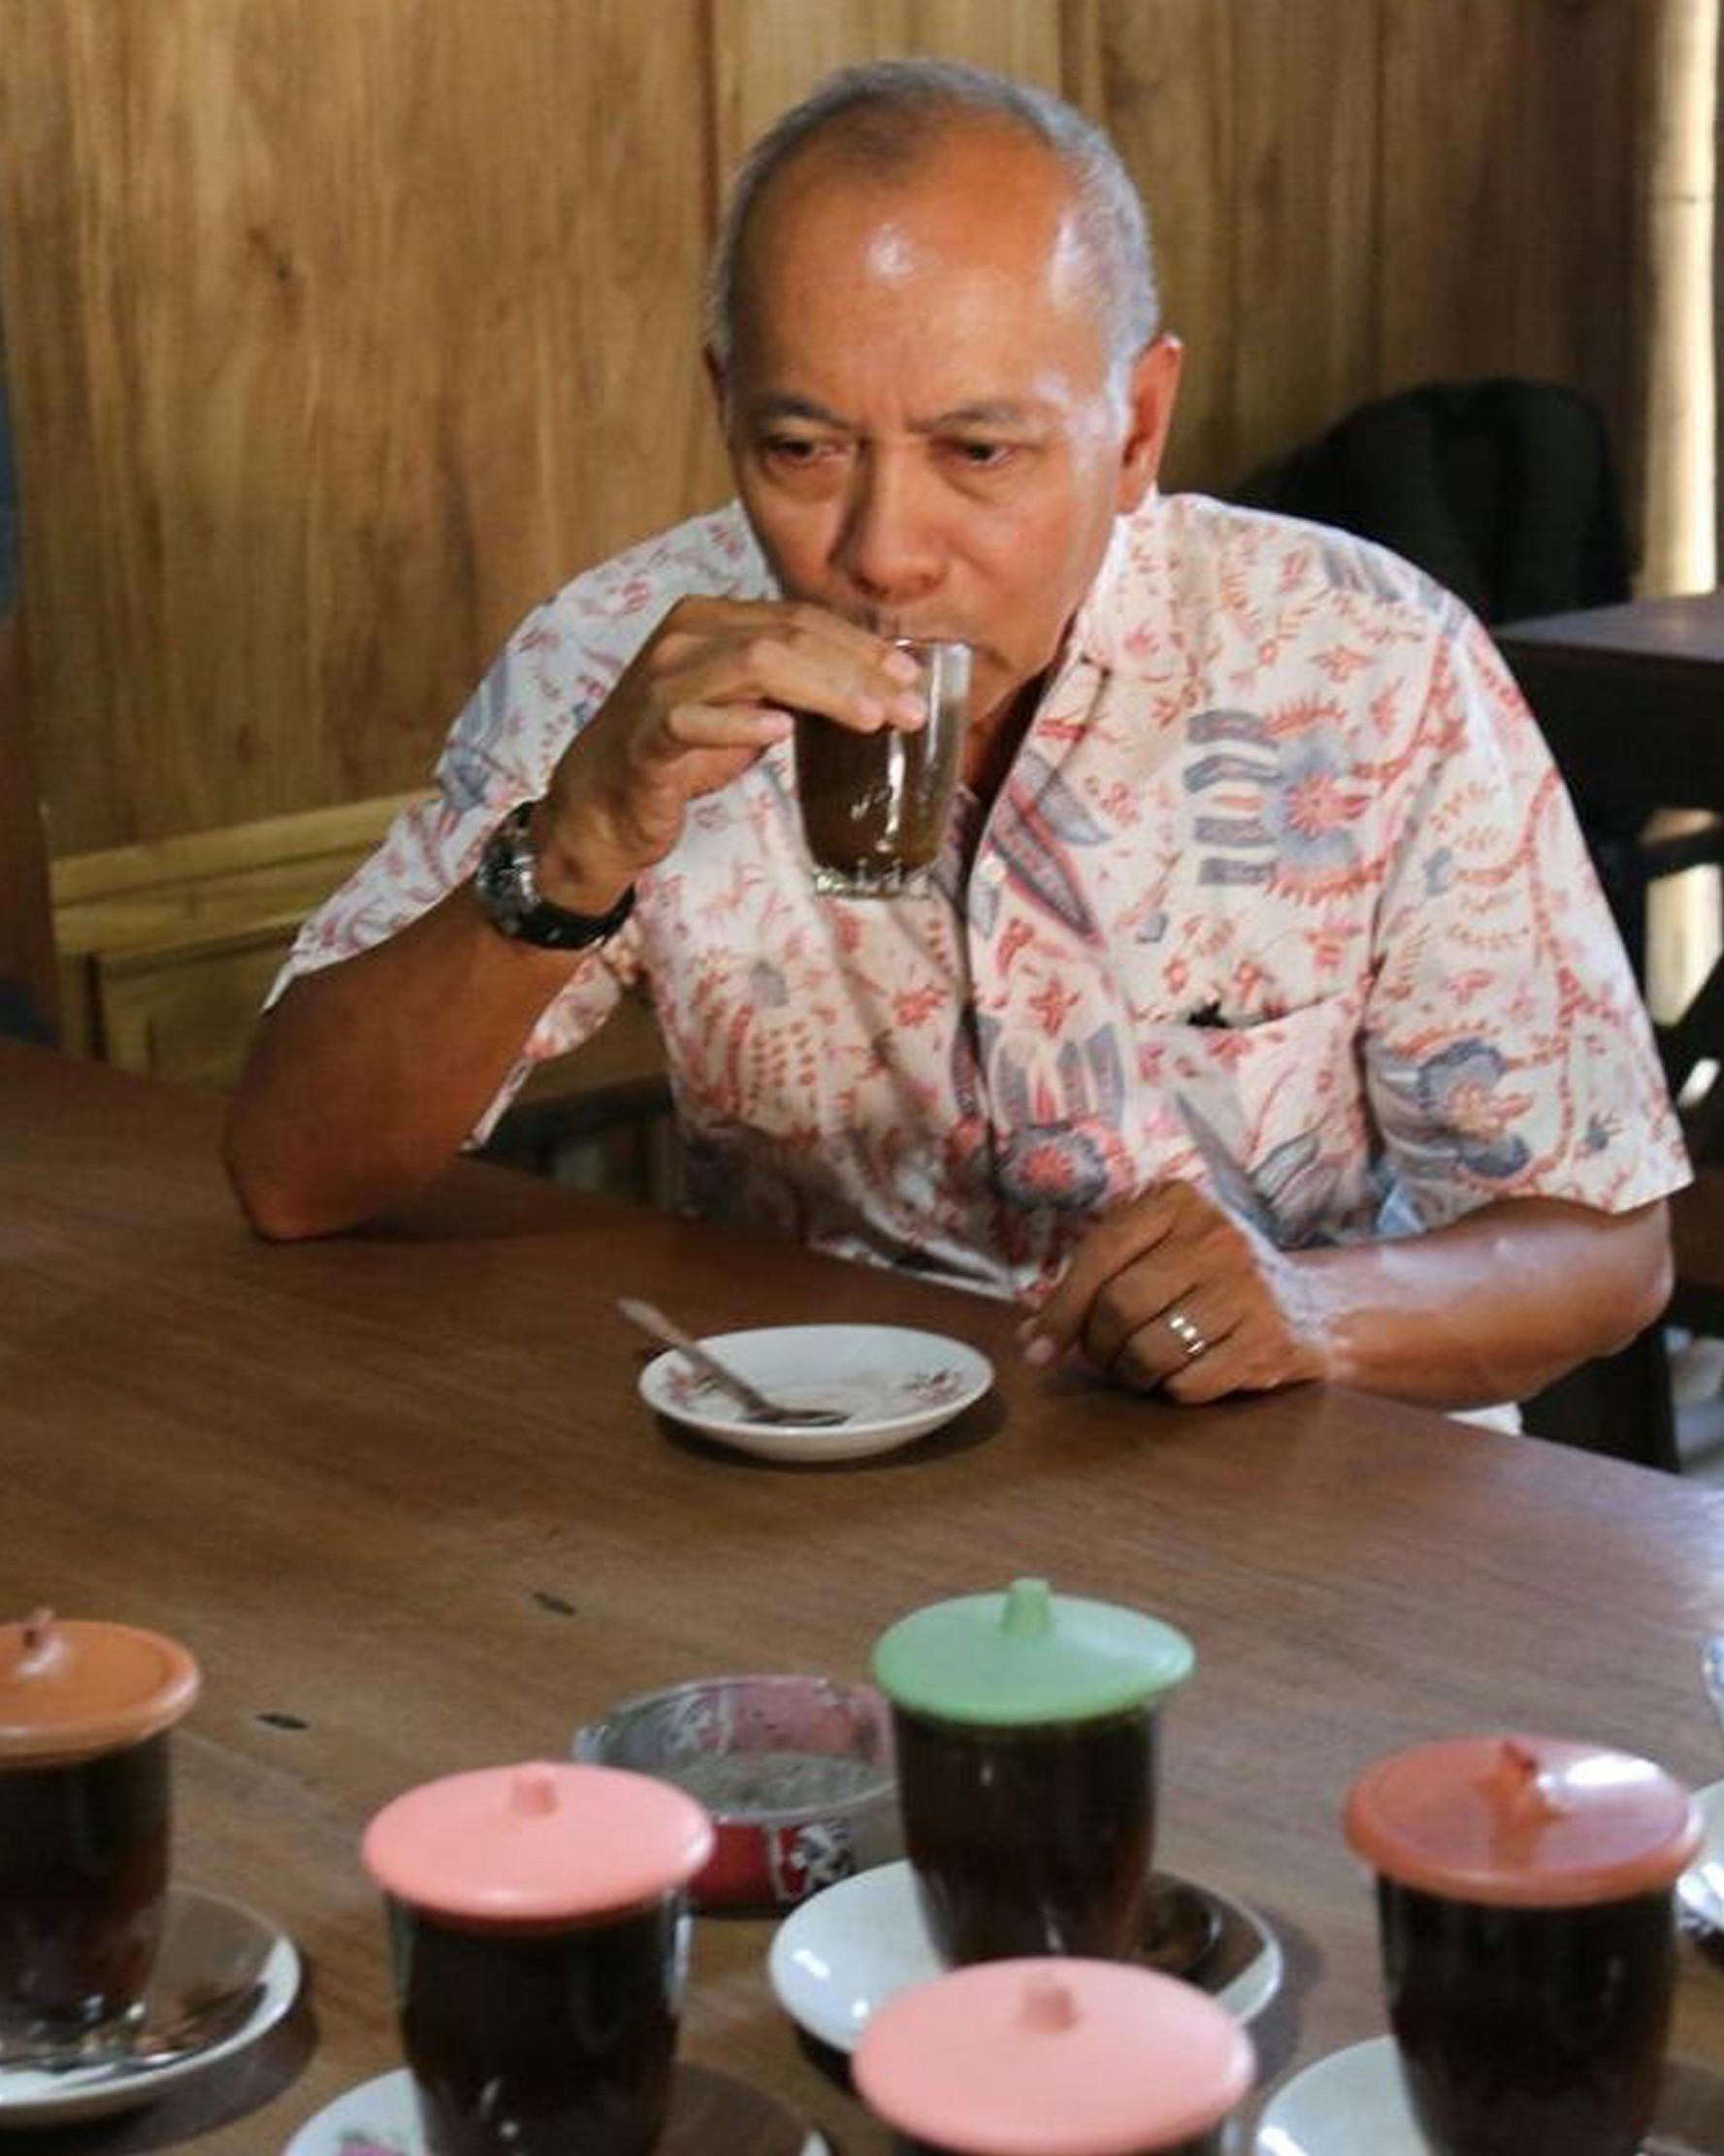 Pakar kuliner Bondan Winarno 'Maknyus' saat menikmati kopi santan khas Blora di Jepangrejo. Bondan wafat pada usia 67 tahun di Rumah Sakit Harapan Kita, Jakarta. (Intagram/maknyusbw)